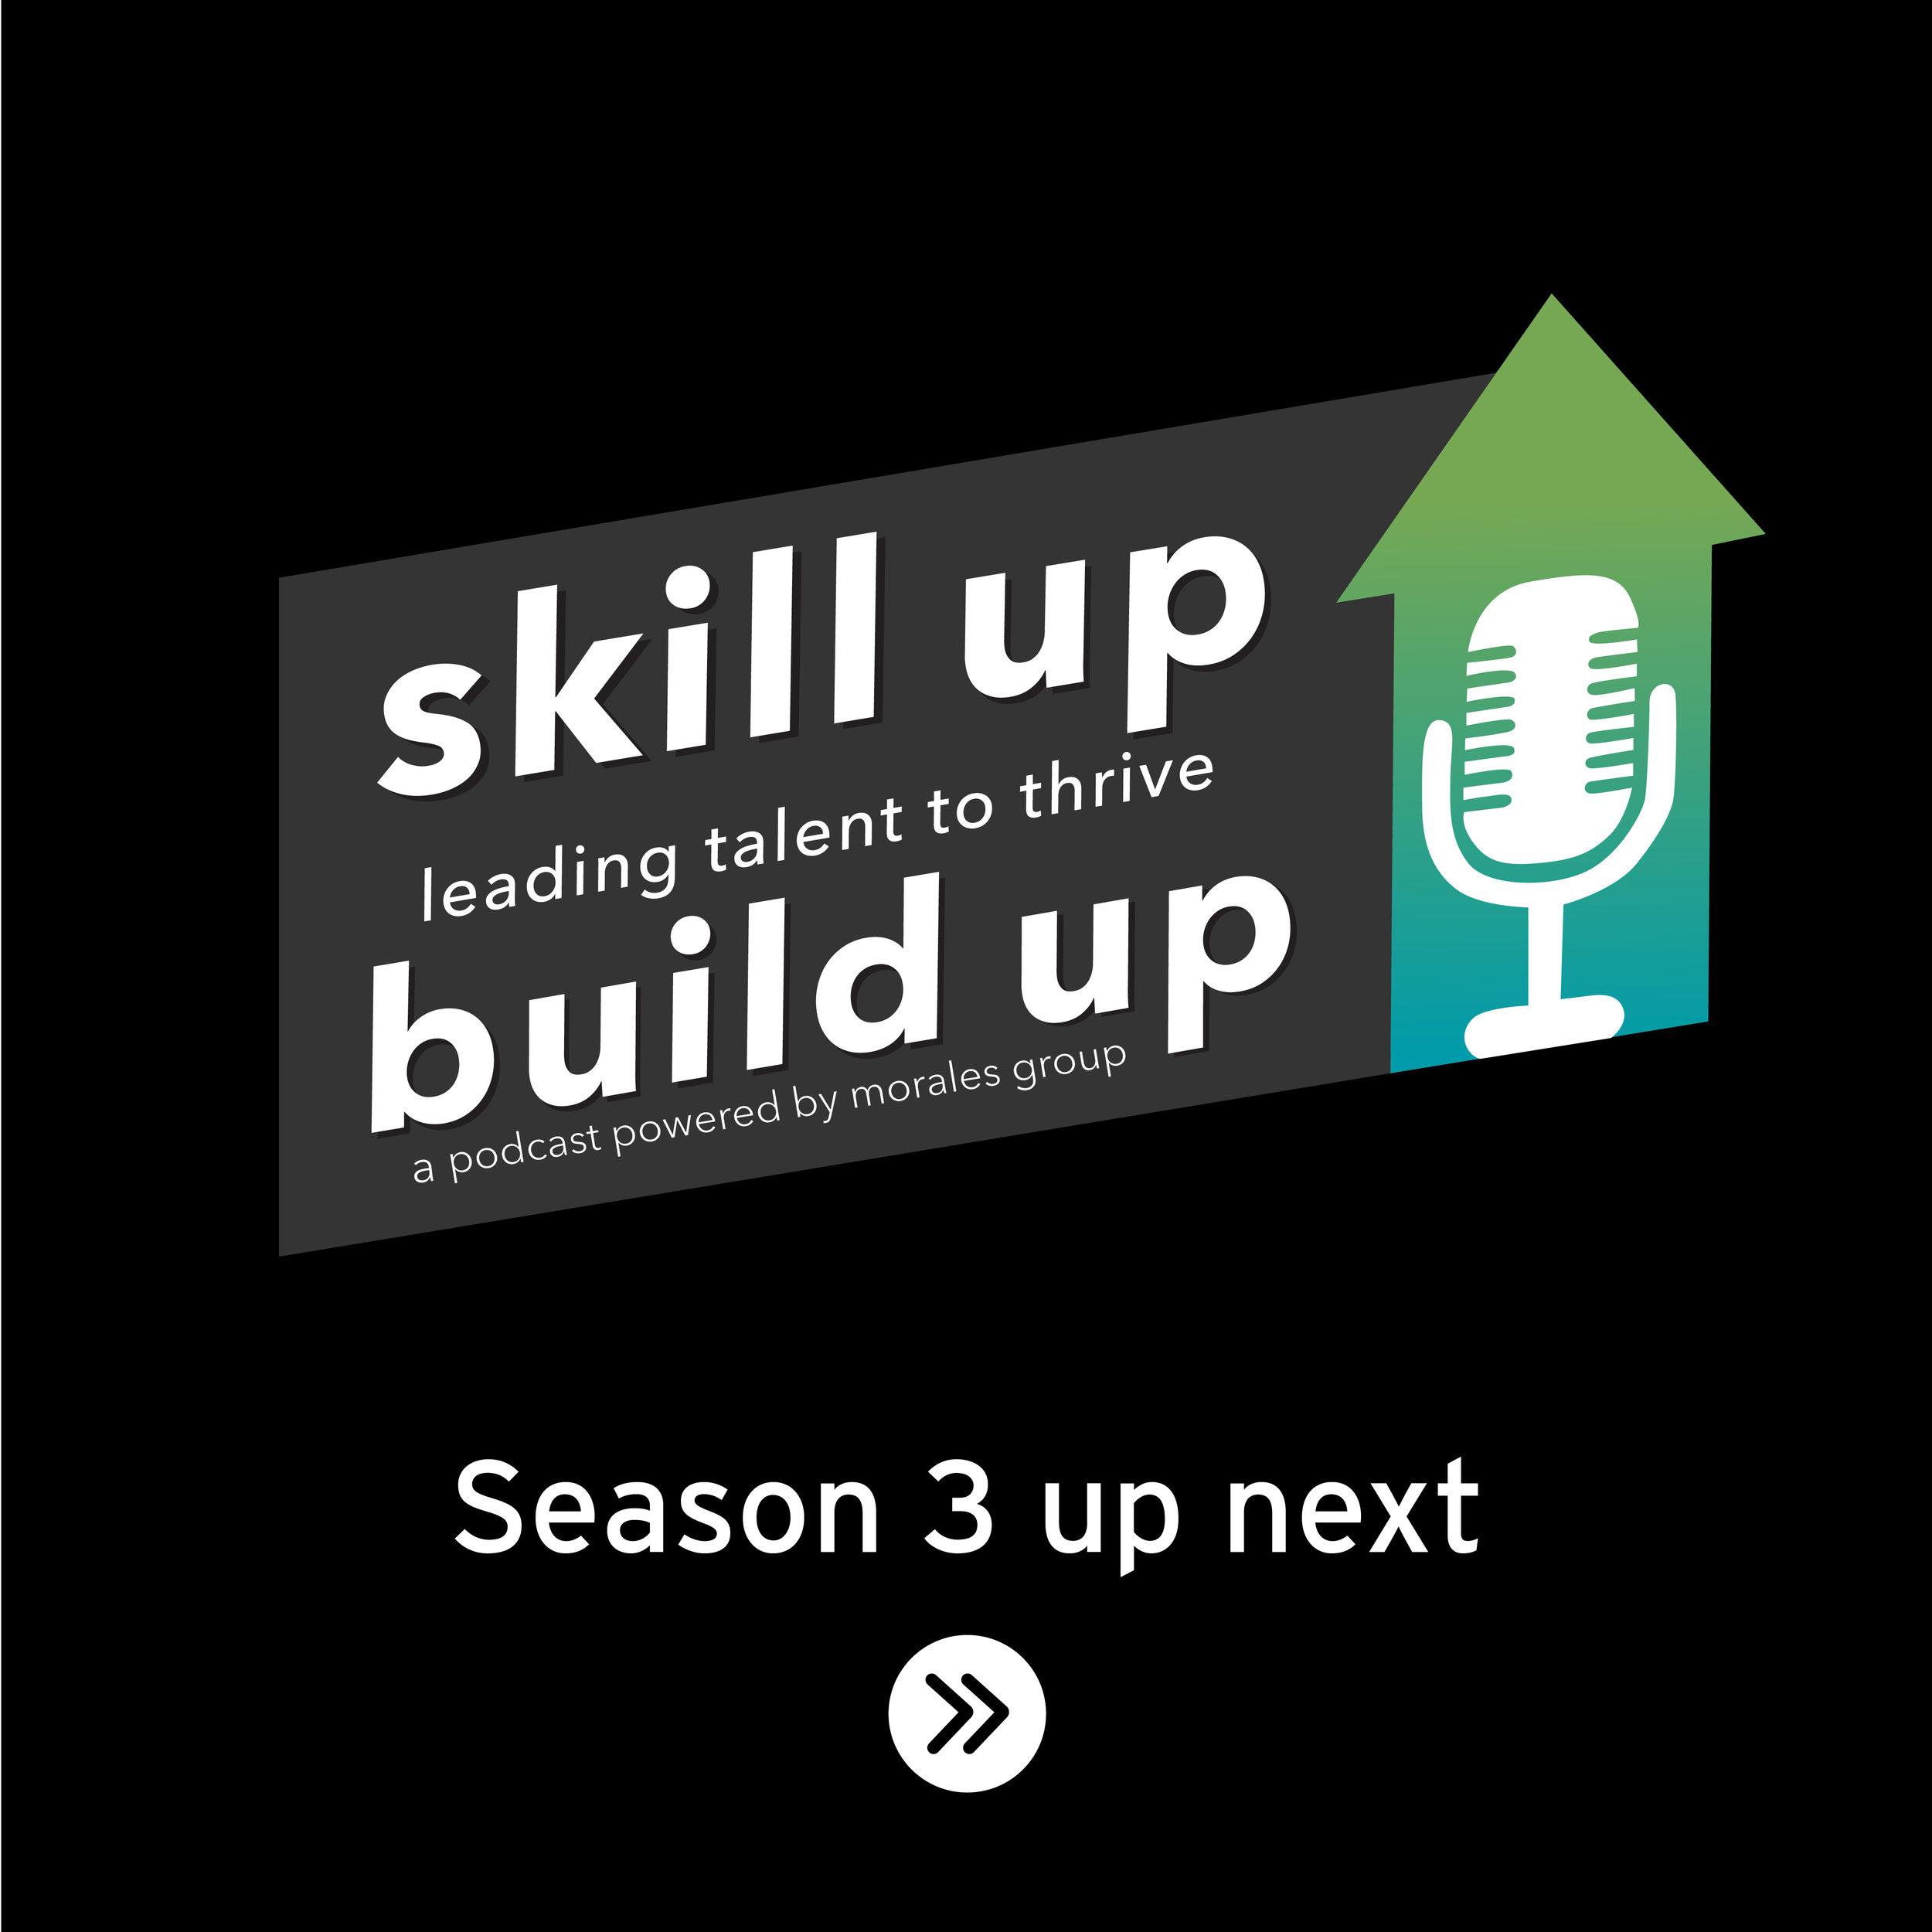 podcast_season3graphic-01.jpg